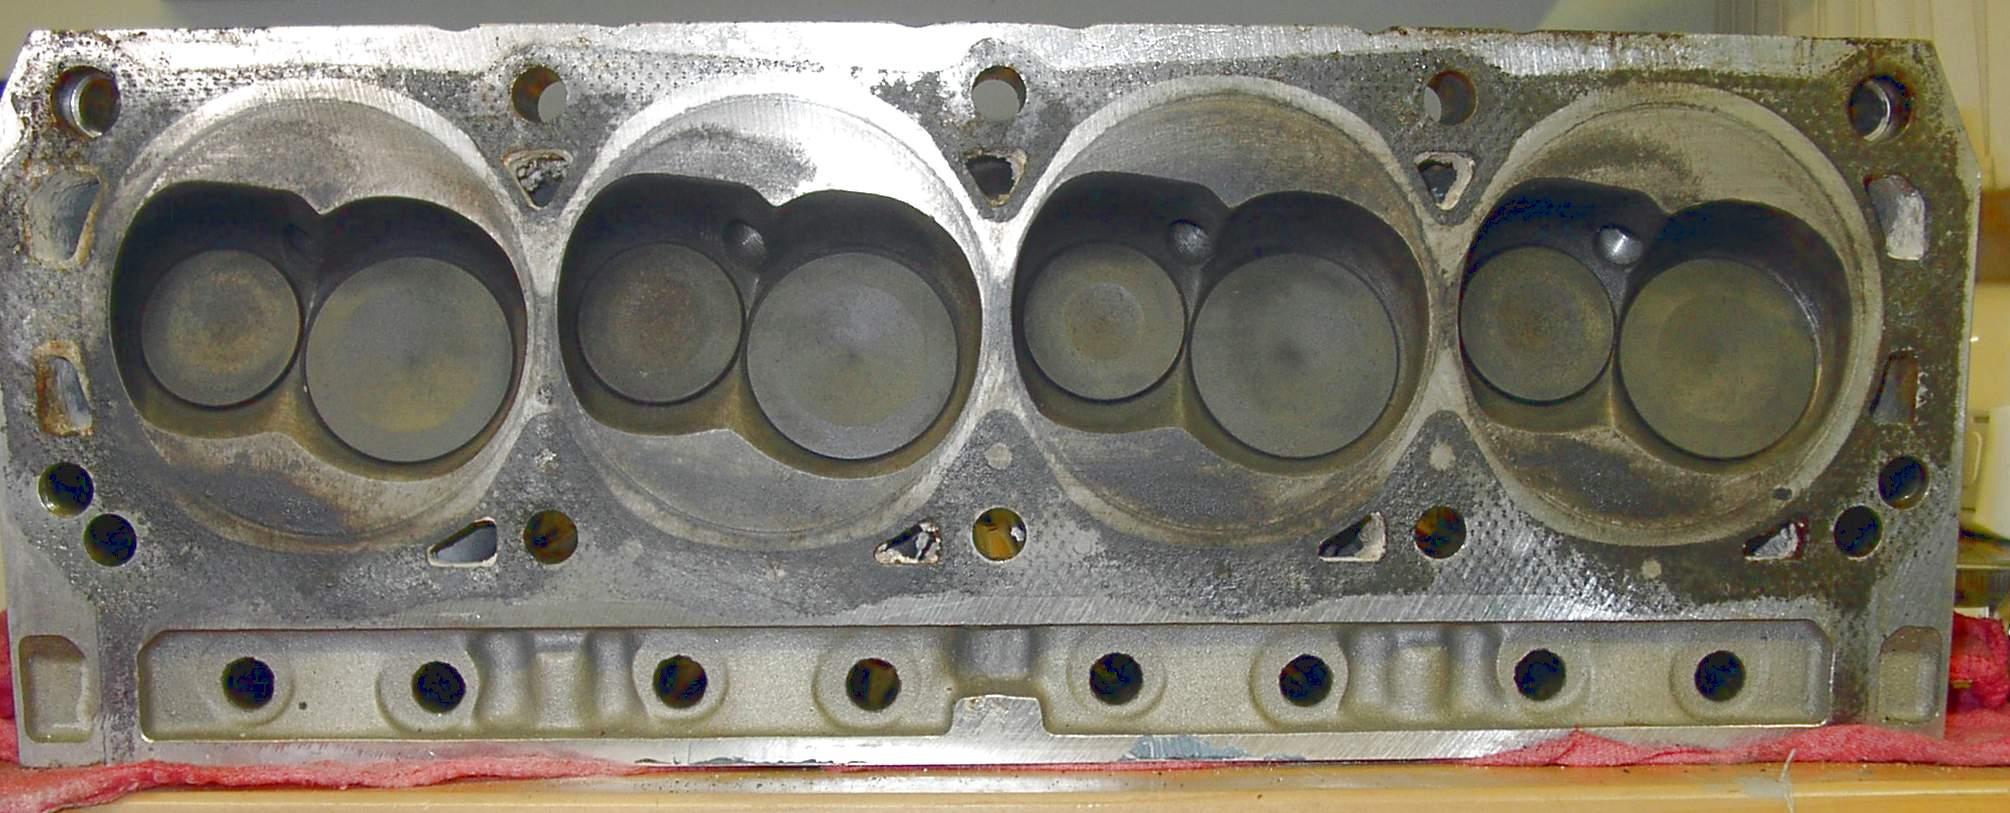 Click image for larger version  Name:number 3928 passanger side cylinder head.JPG Views:47 Size:212.3 KB ID:191424